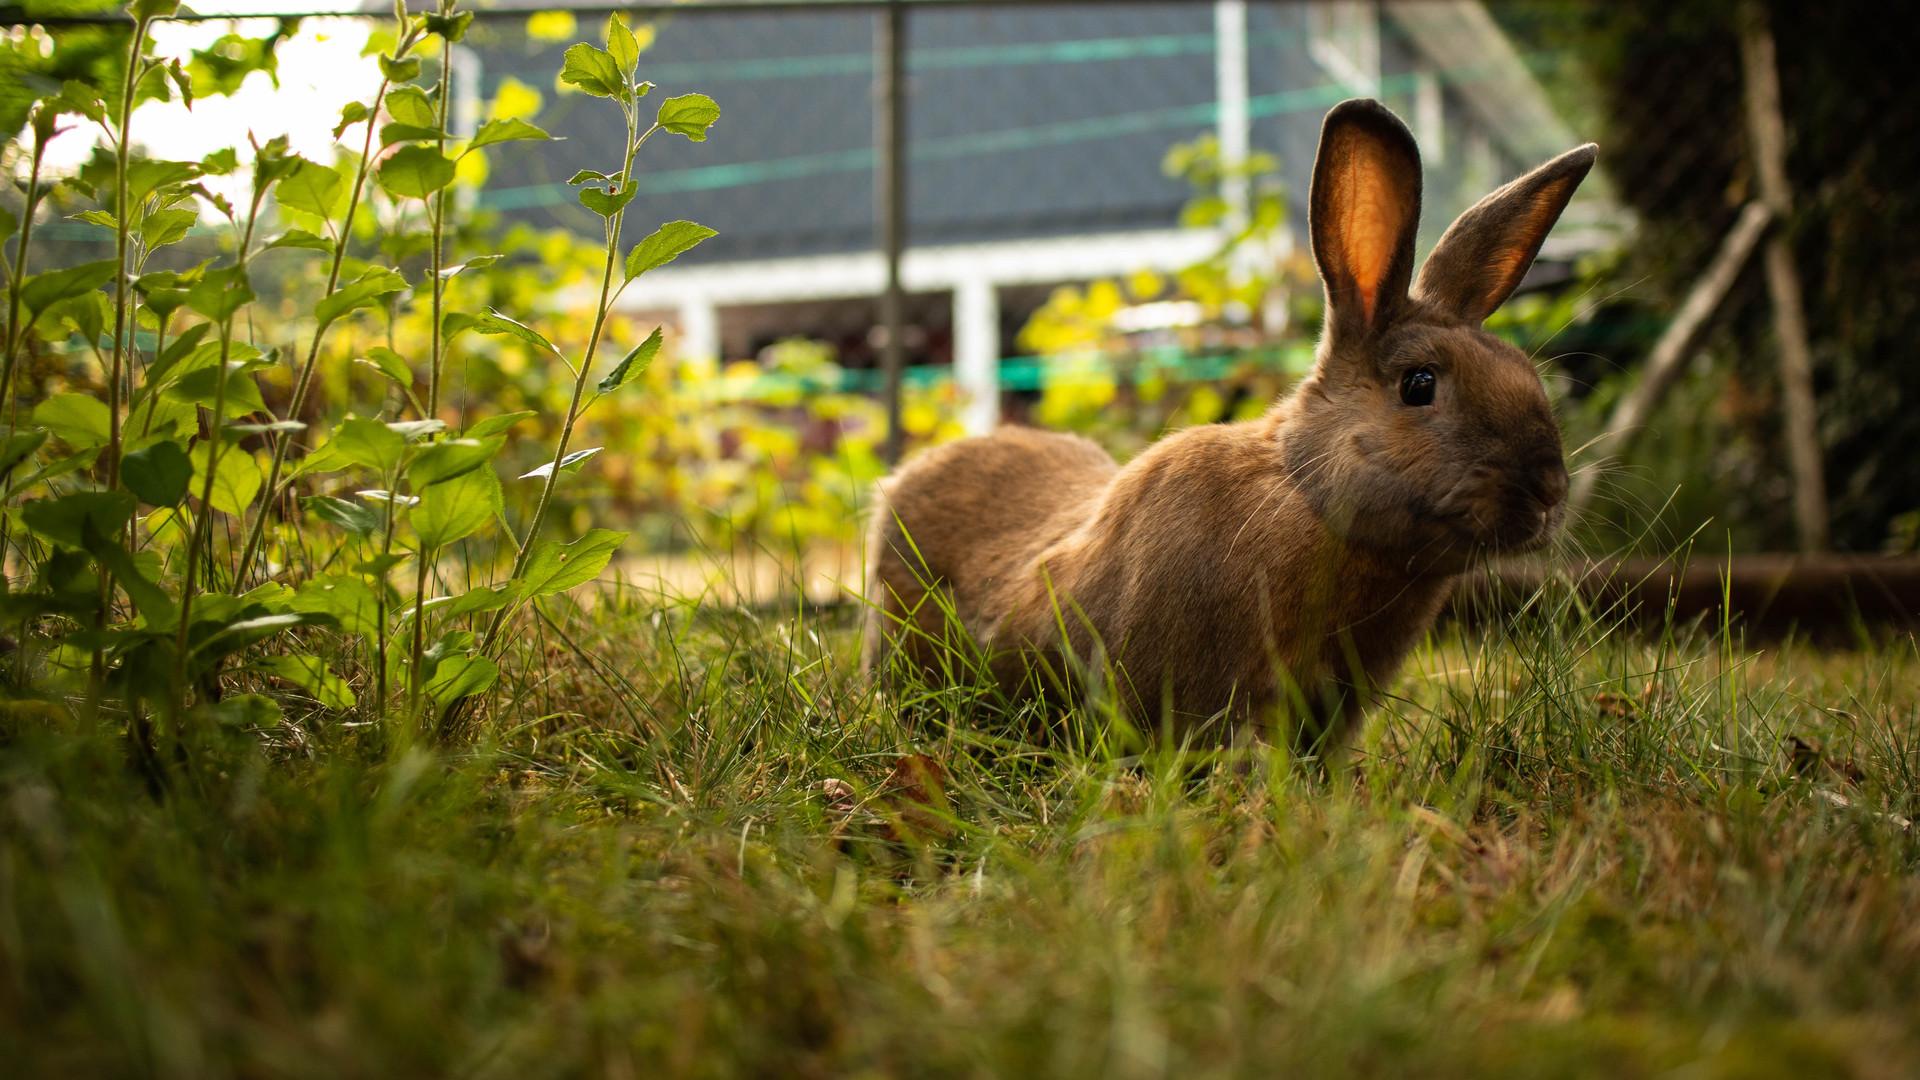 Woodgrove Animal Hospital Rabbit.jpg